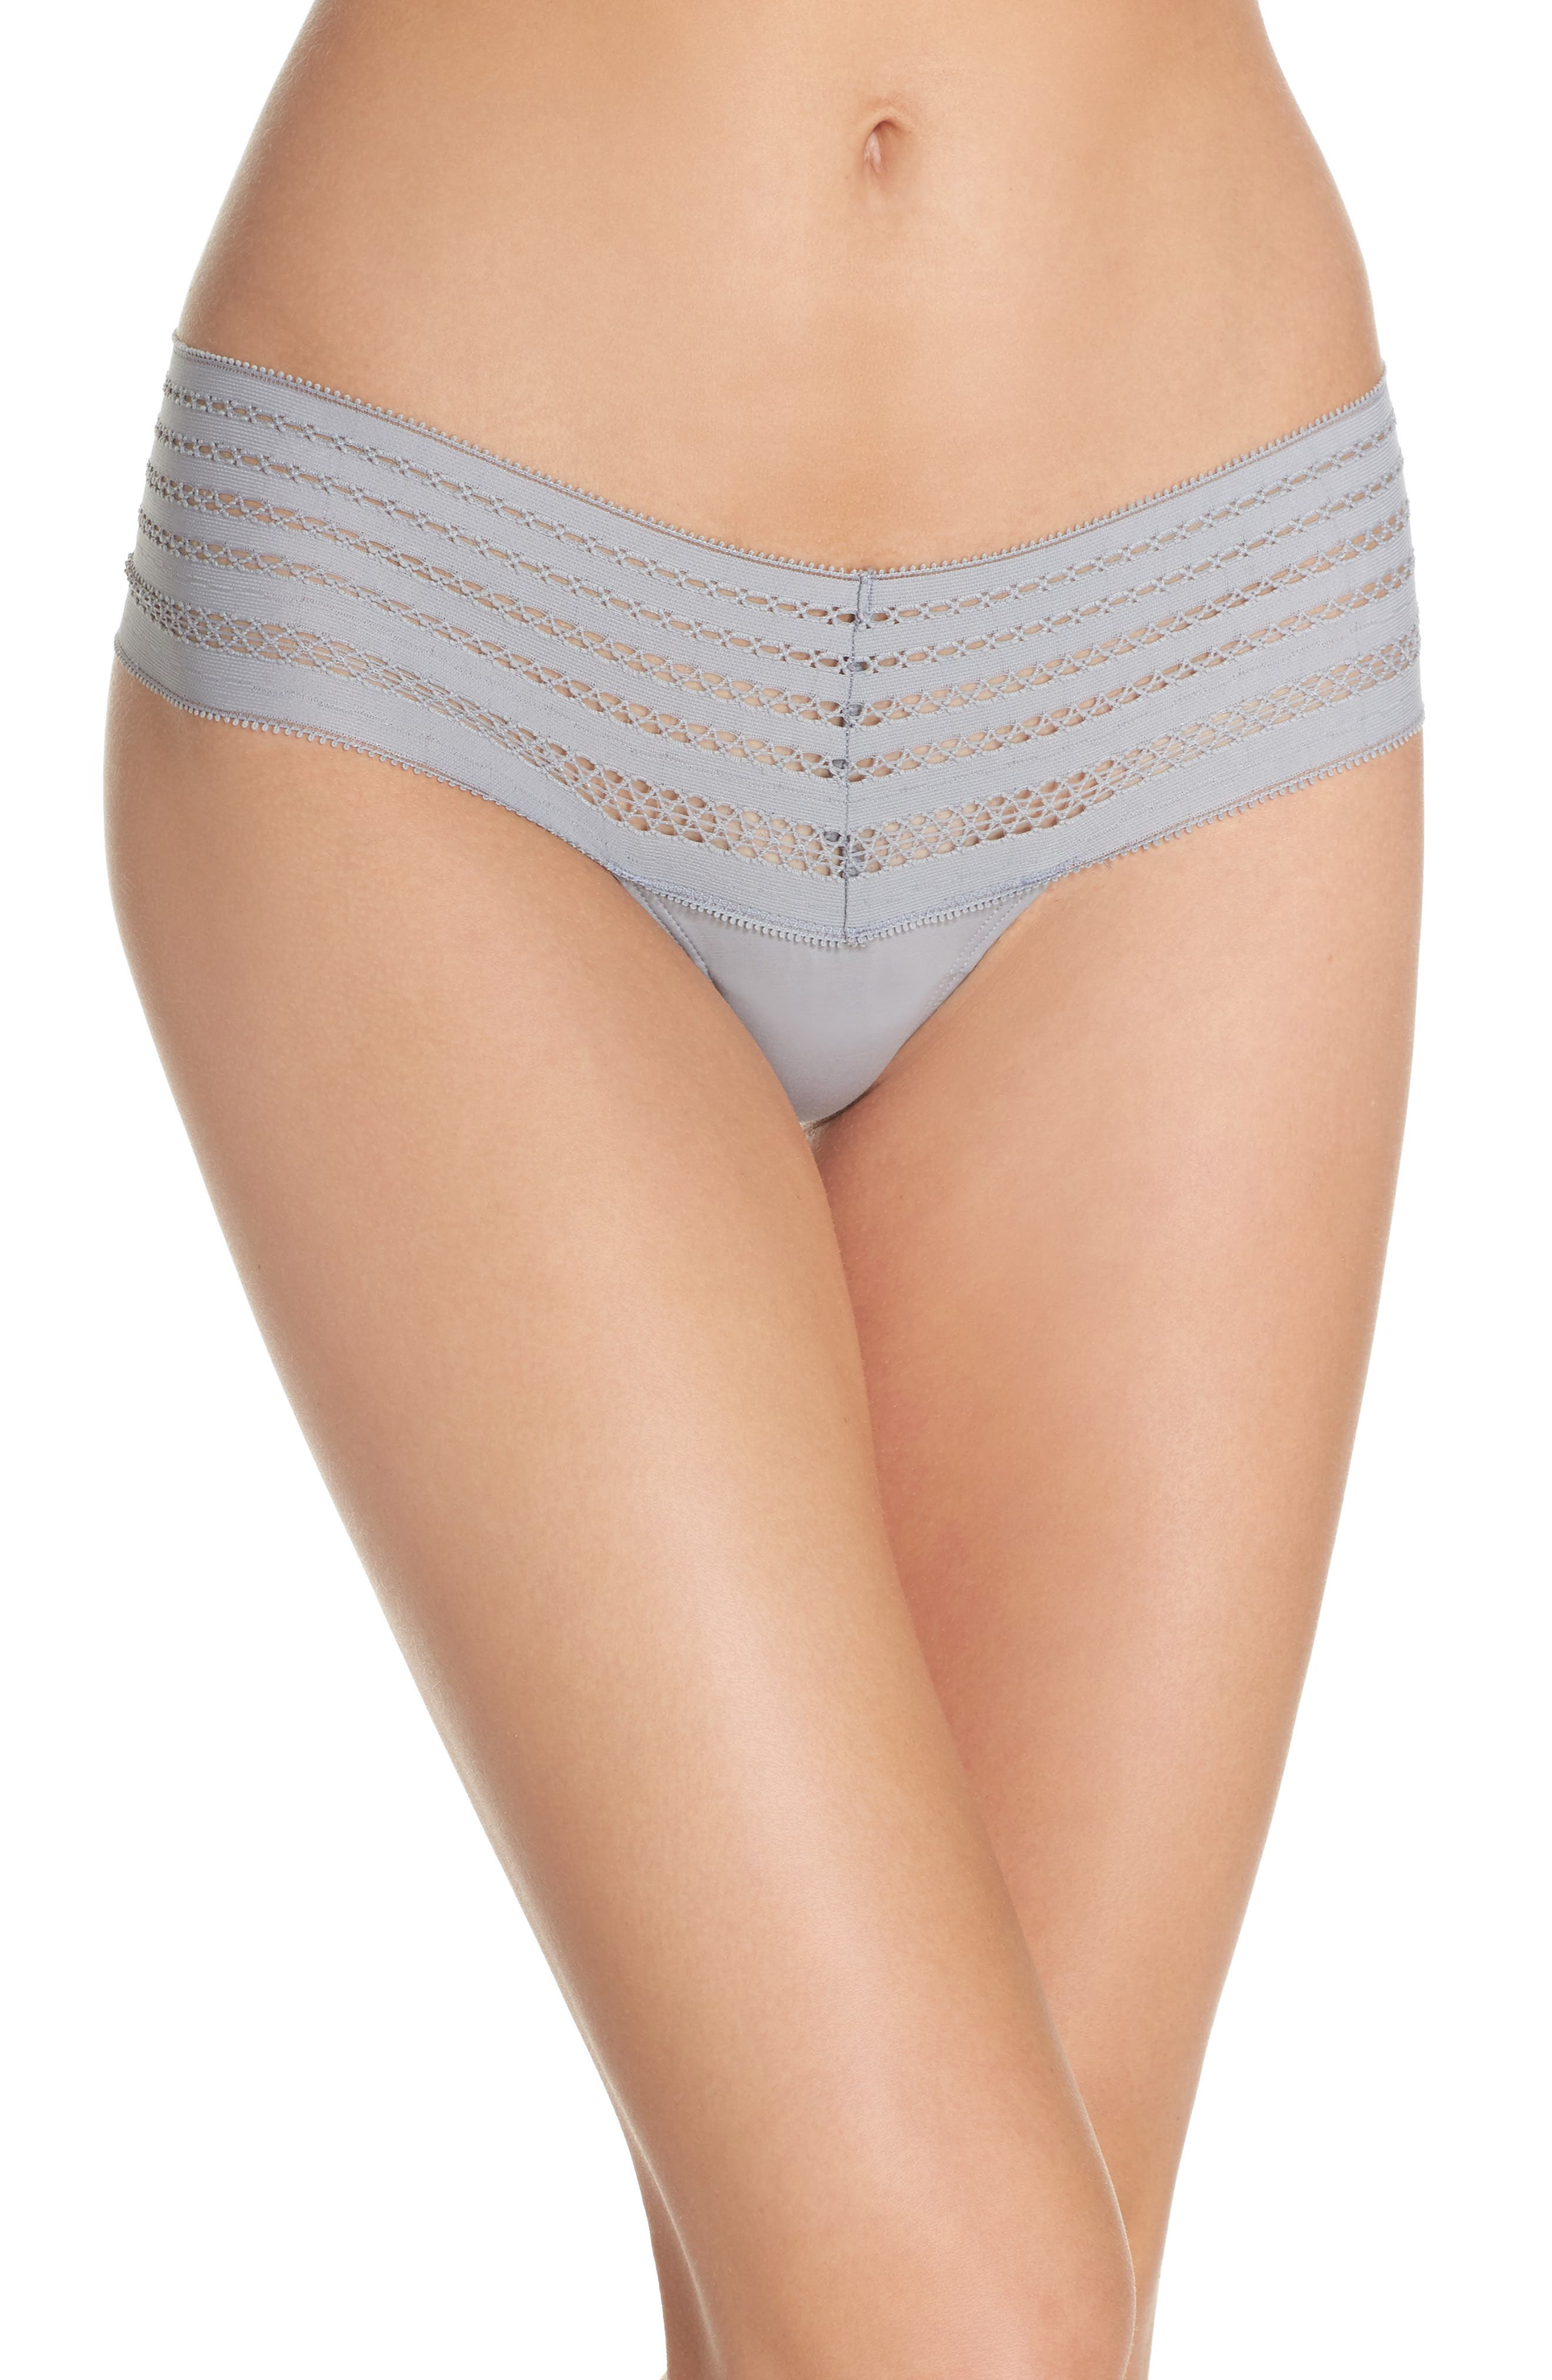 Lace Thong,                         Main,                         color, Mid Grey